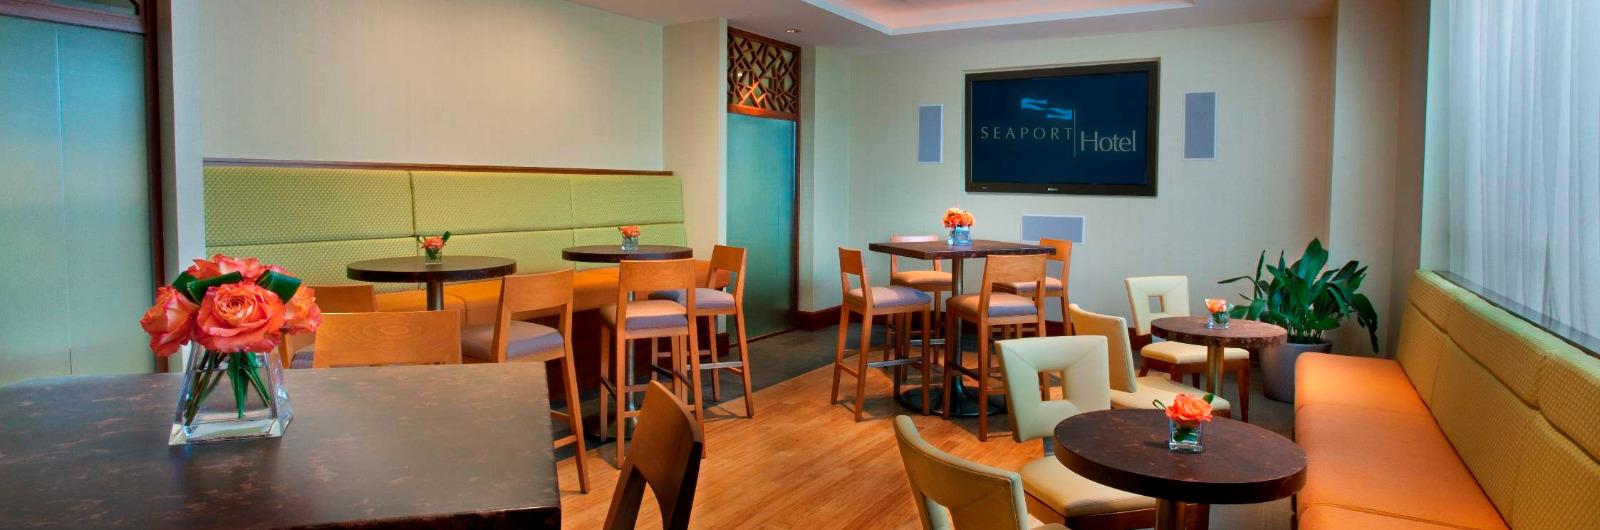 Massachusetts Hotel Private Dining